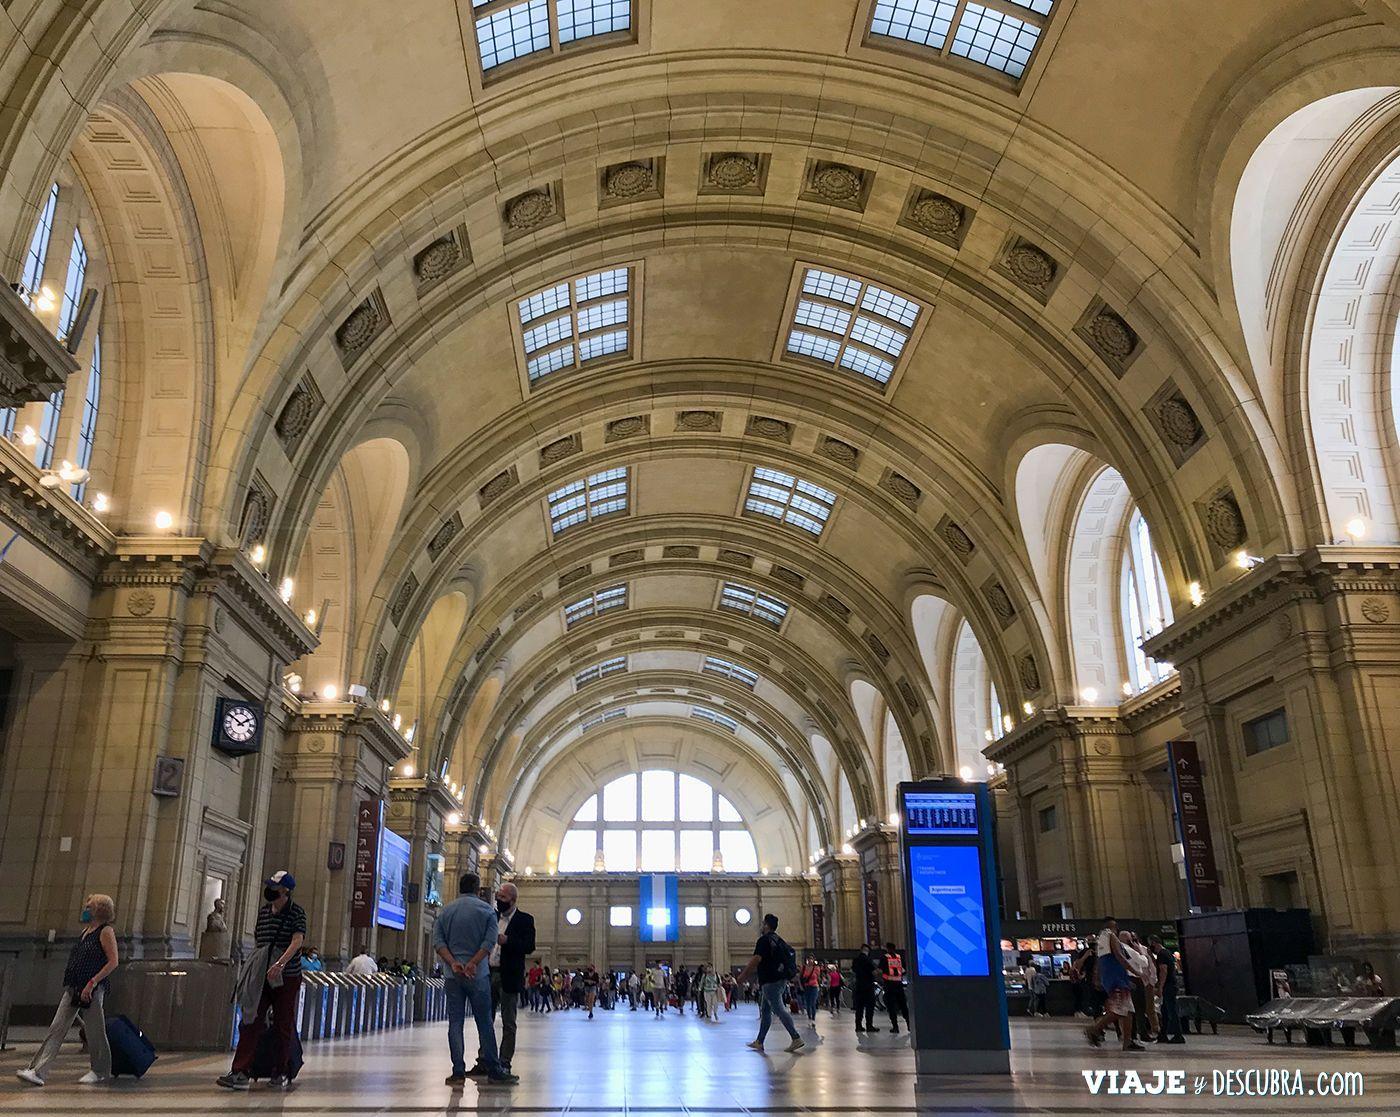 estacion-de-constitucion,-trenes-argentinos,-tren-buenos-aires-mar-del-plata